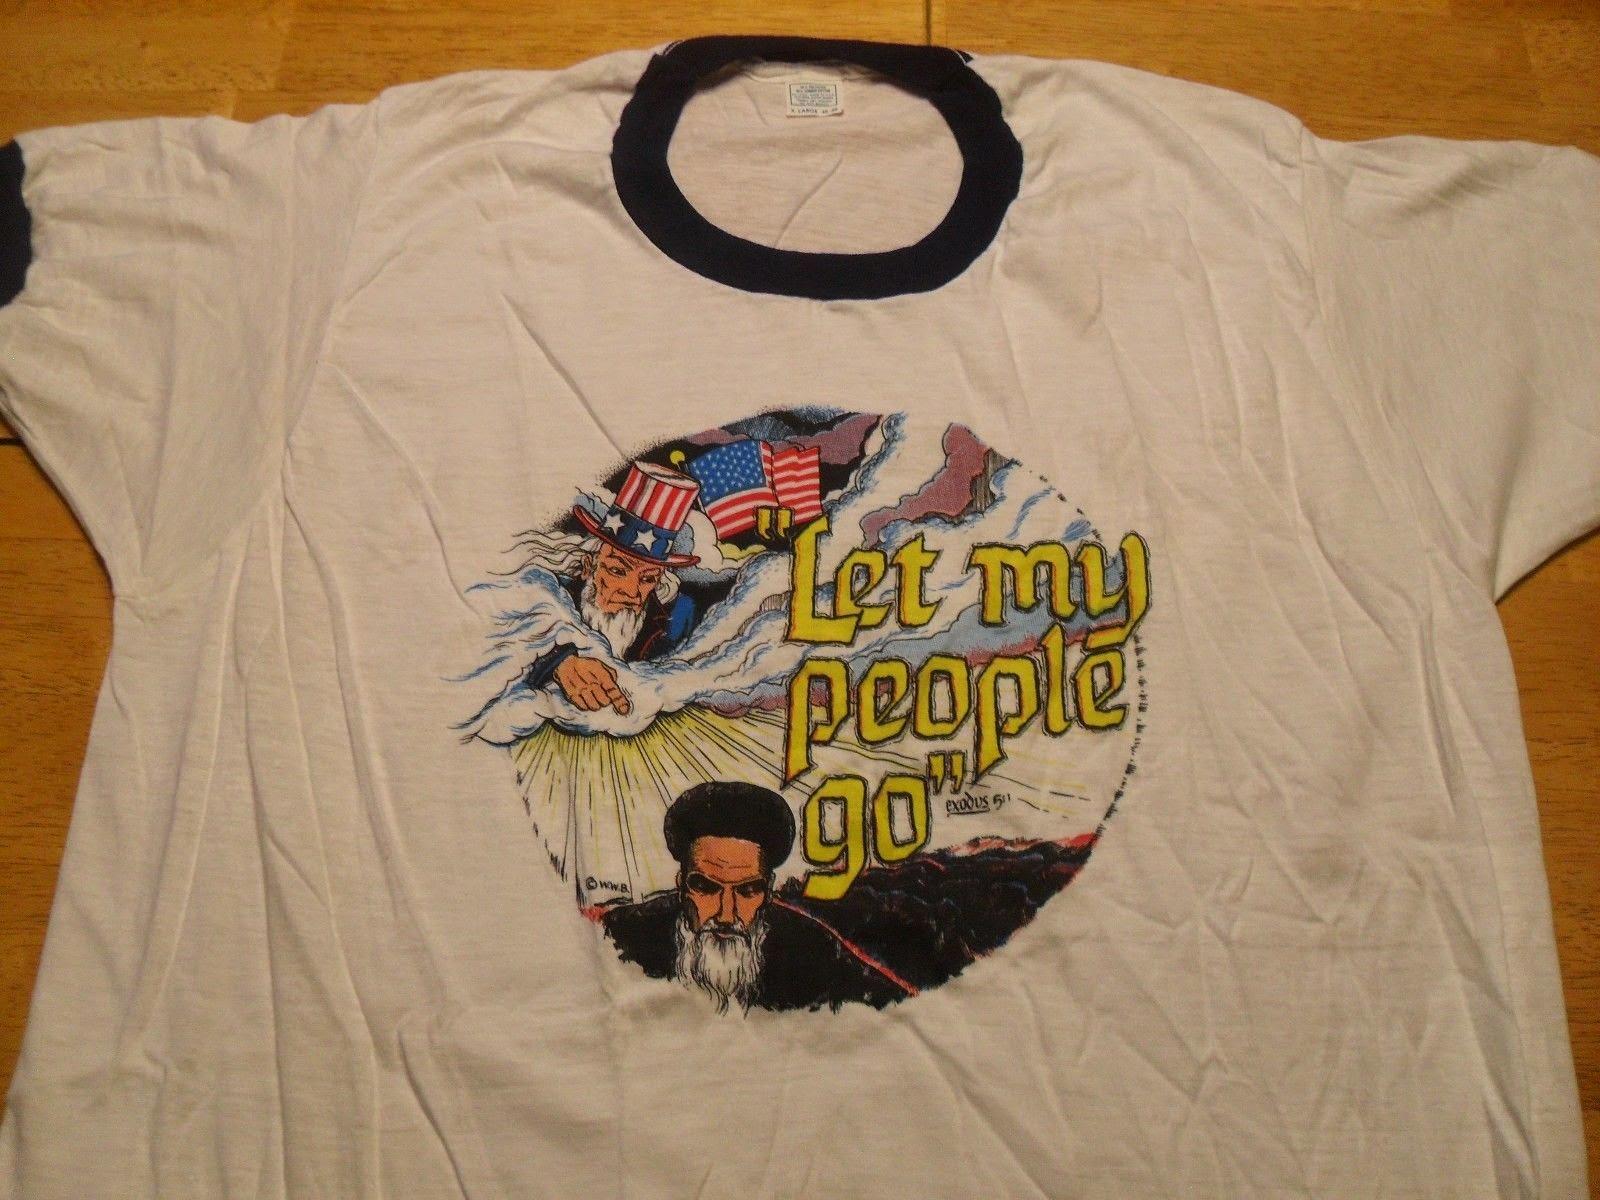 VTG '79 Iran Hostage Crisis Ayatollah Khomeini Ringer T-Shirt Adult M 50/50